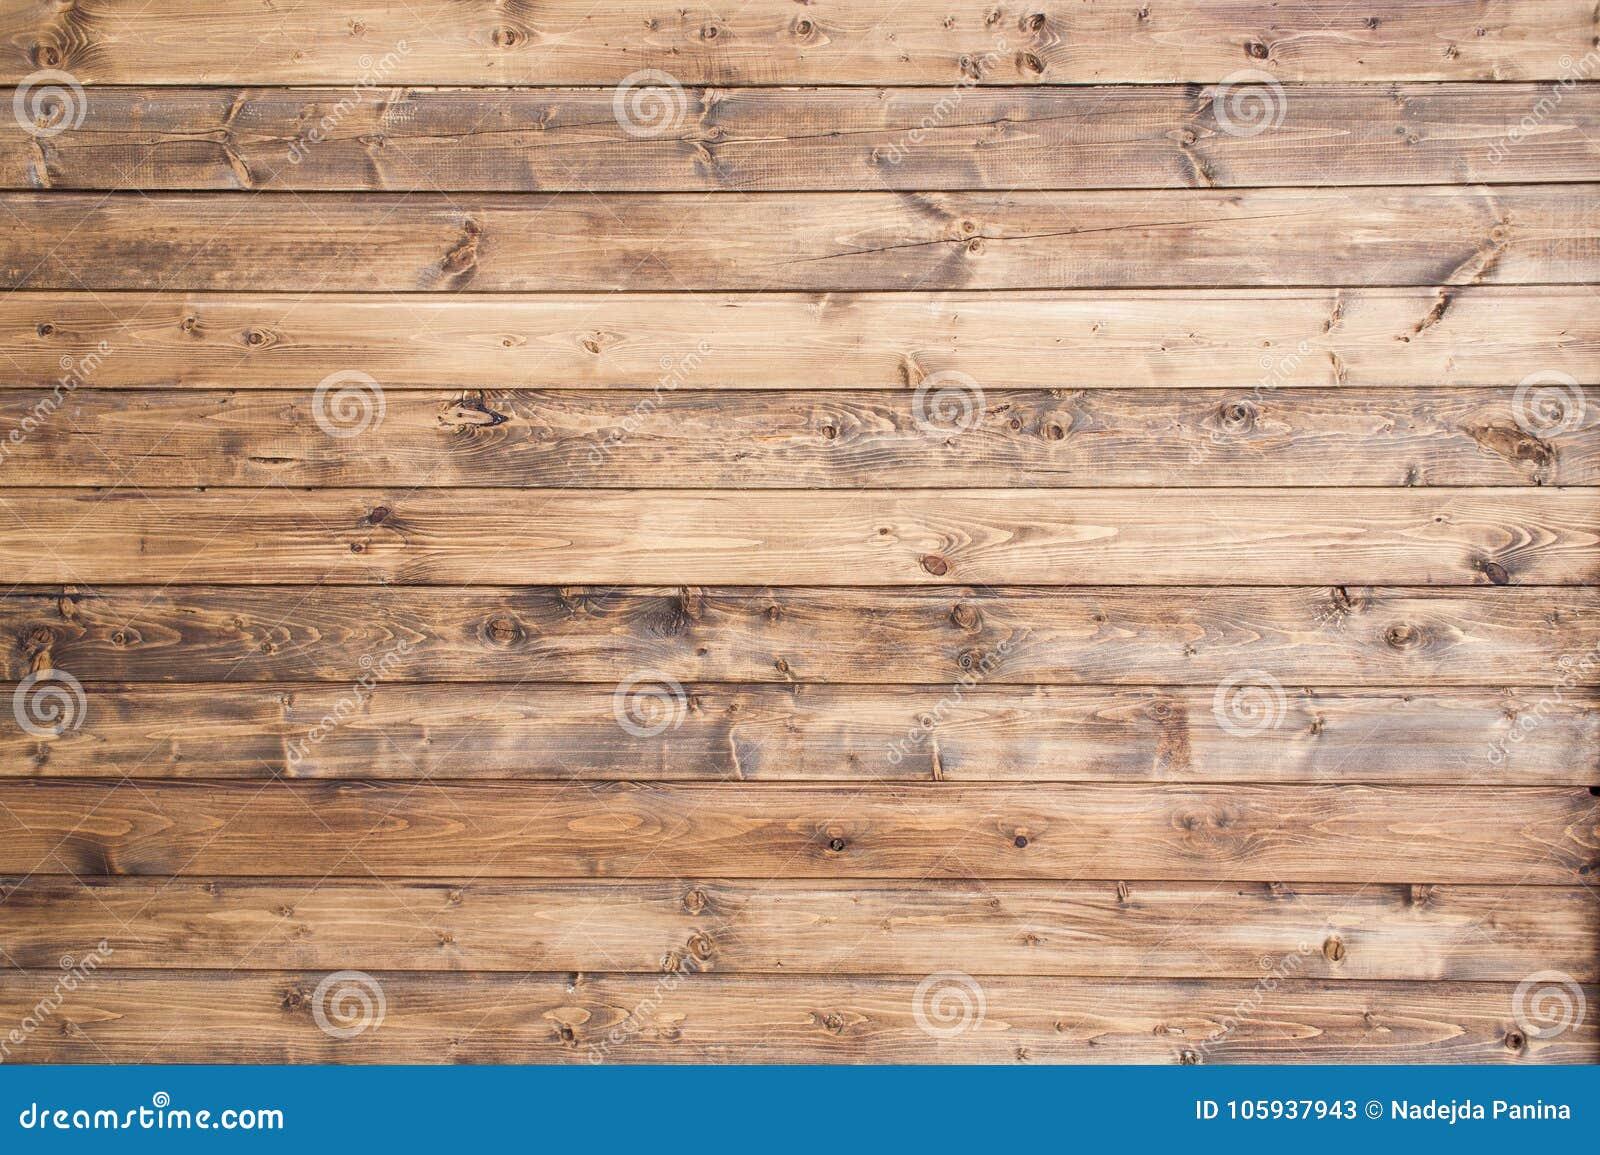 La forma oval redonda oscura, fondo de madera del panel, color marrón natural, apila horizontal para mostrar textura del grano co